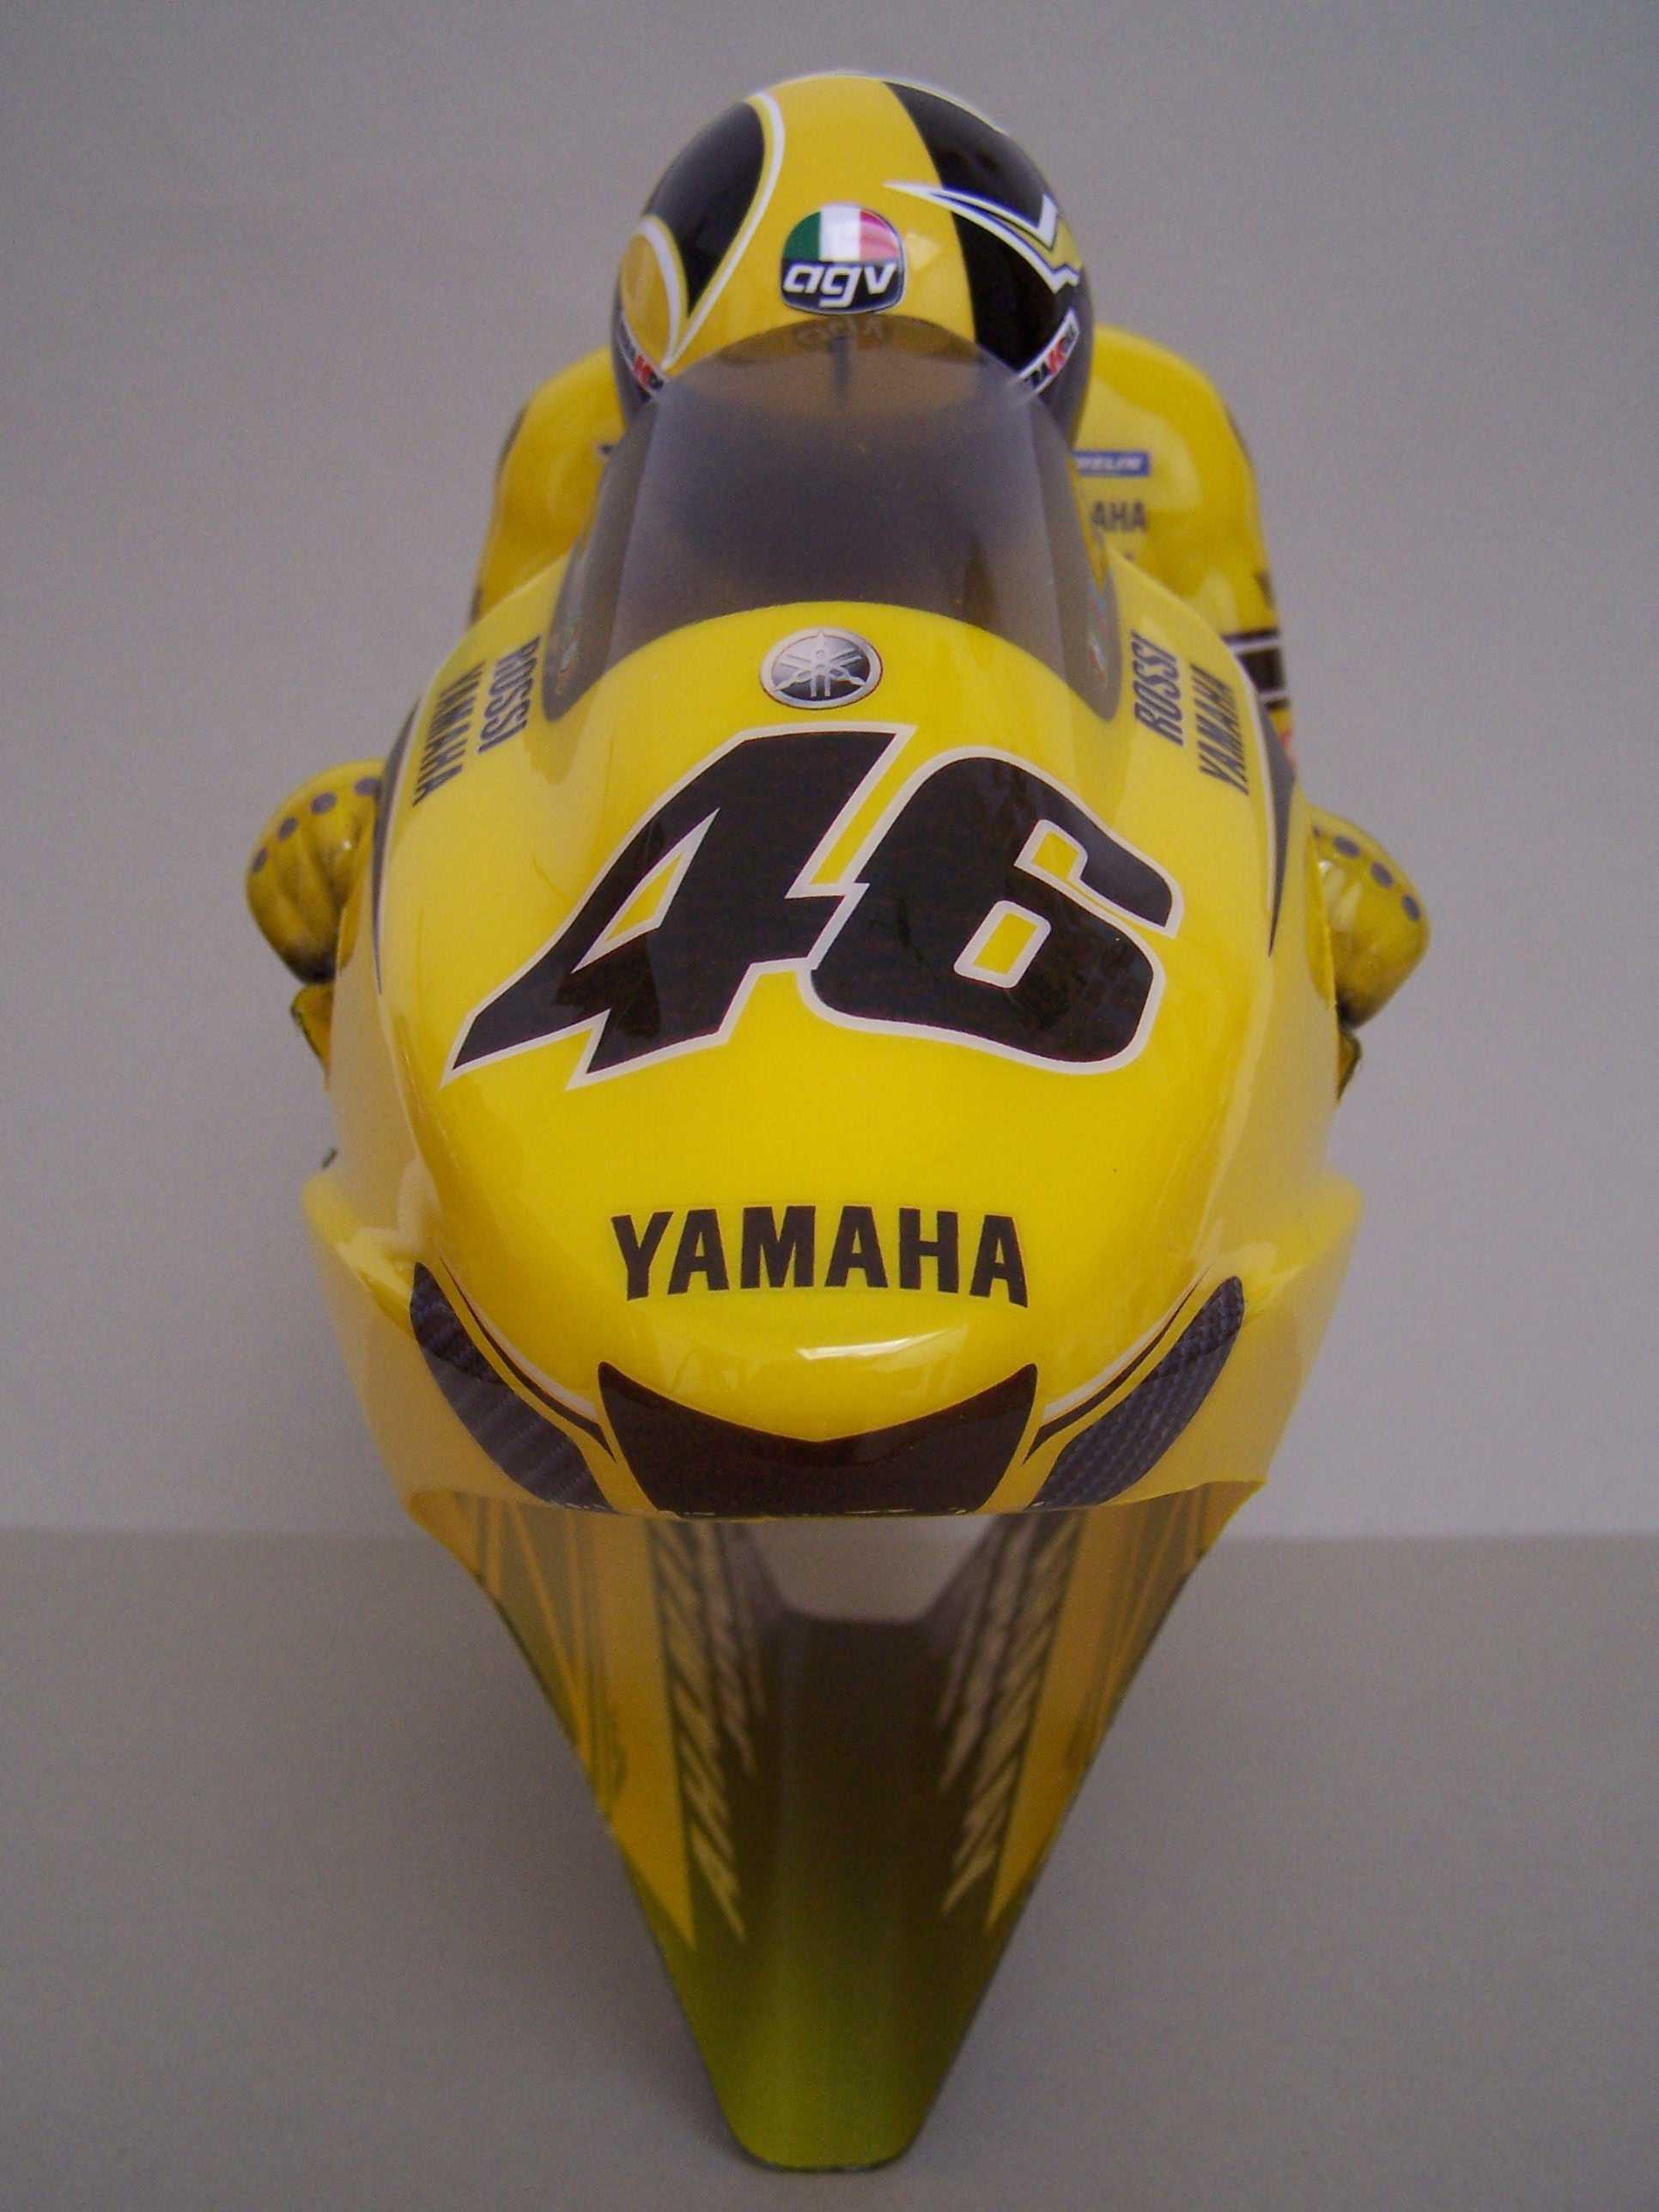 [Yamaha-Rossi-Laguna-Seca-2005-4.jpg]